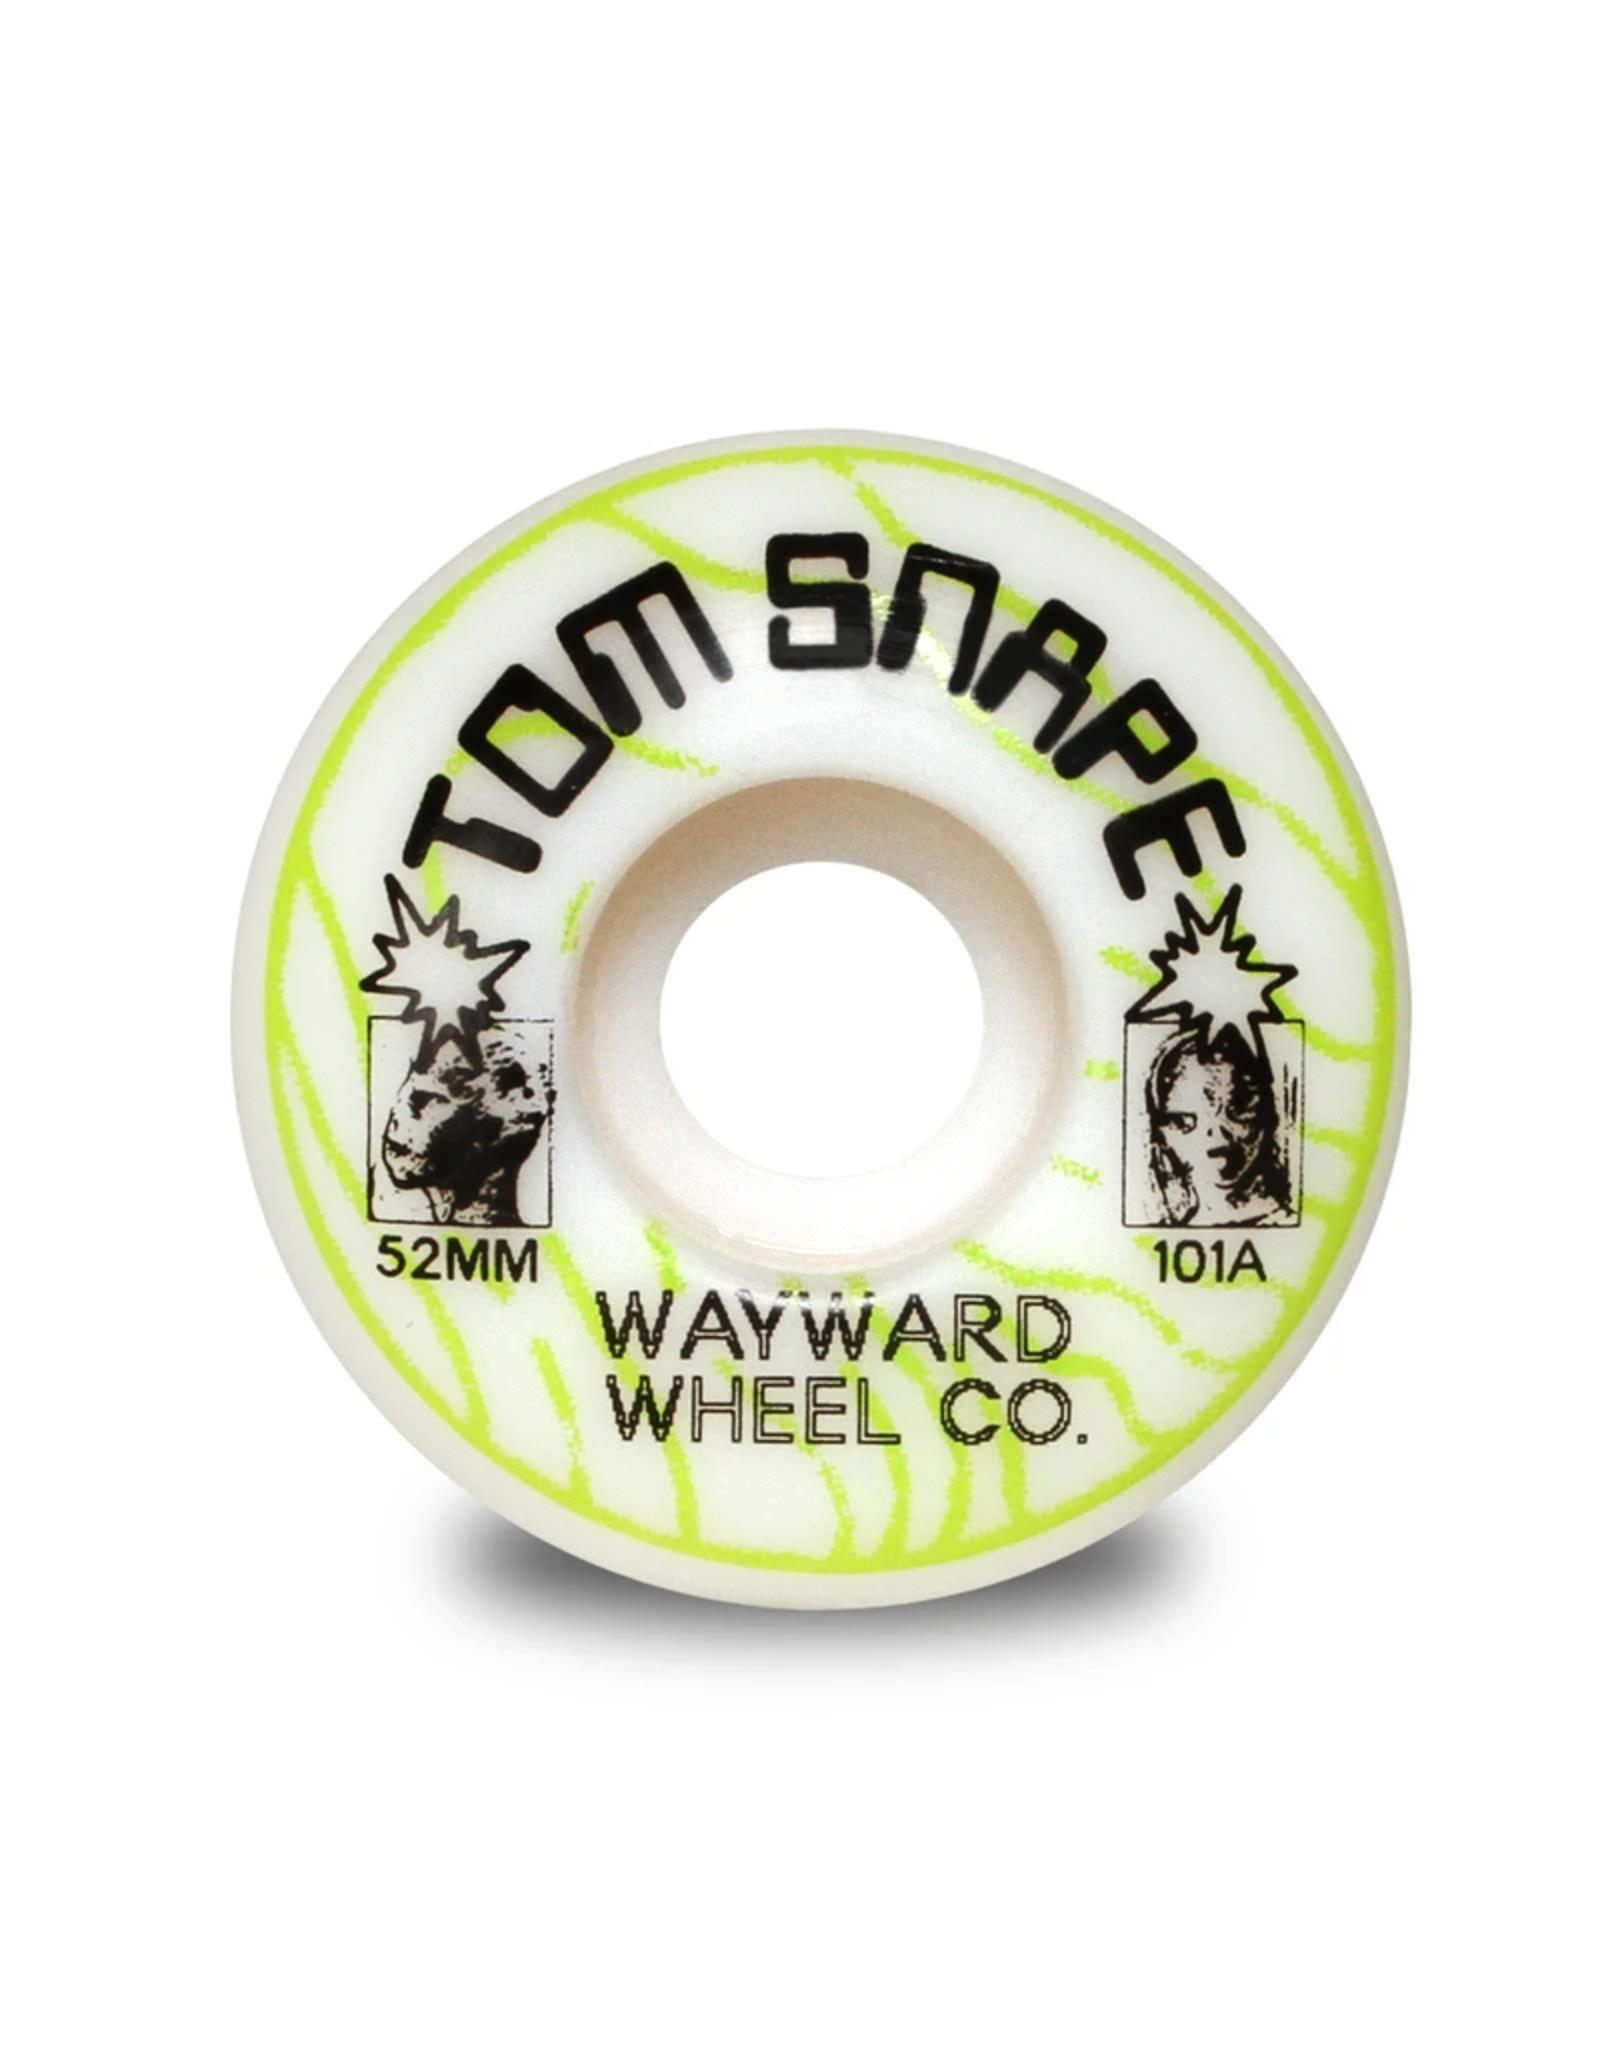 Wayward Wheels Wayward - Classic 101a - Tom Snape PRO 52mm